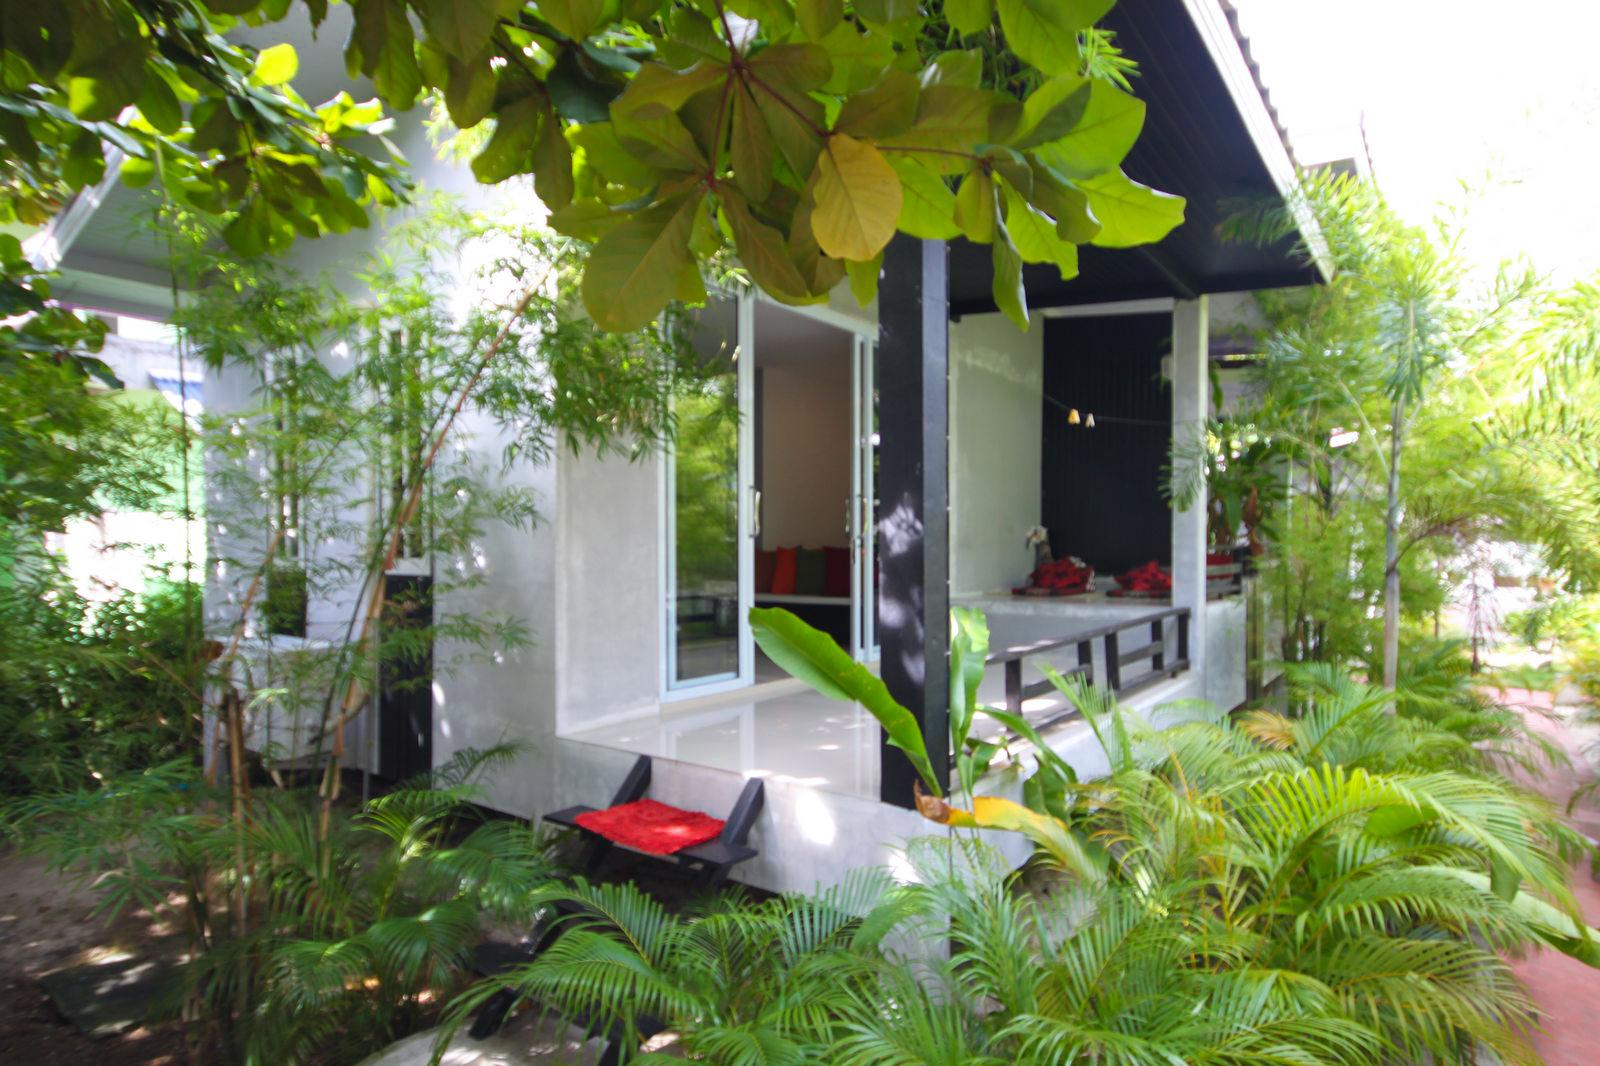 jungle-hooping-koh-pangan-thailand-resort-location_Numero seriale a 2 cifre_1.JPG